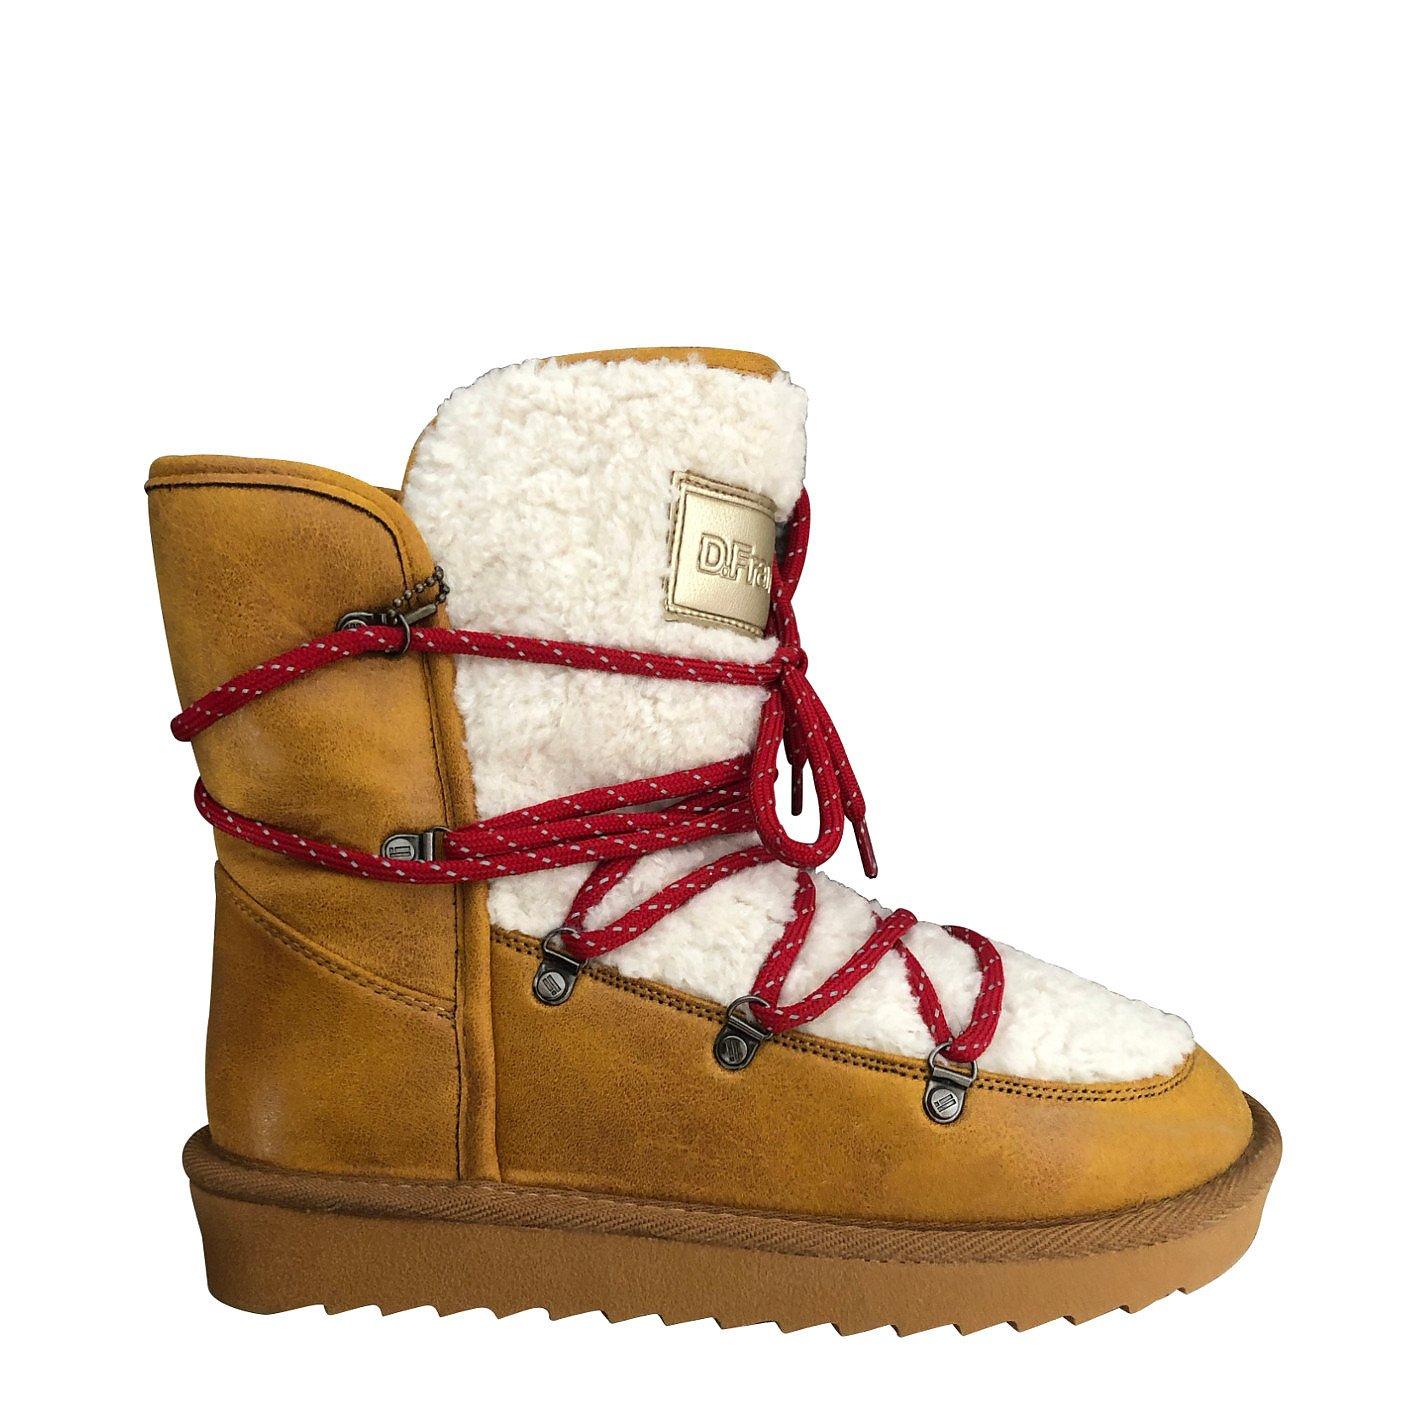 D.Franklin Nordic TRK Boots